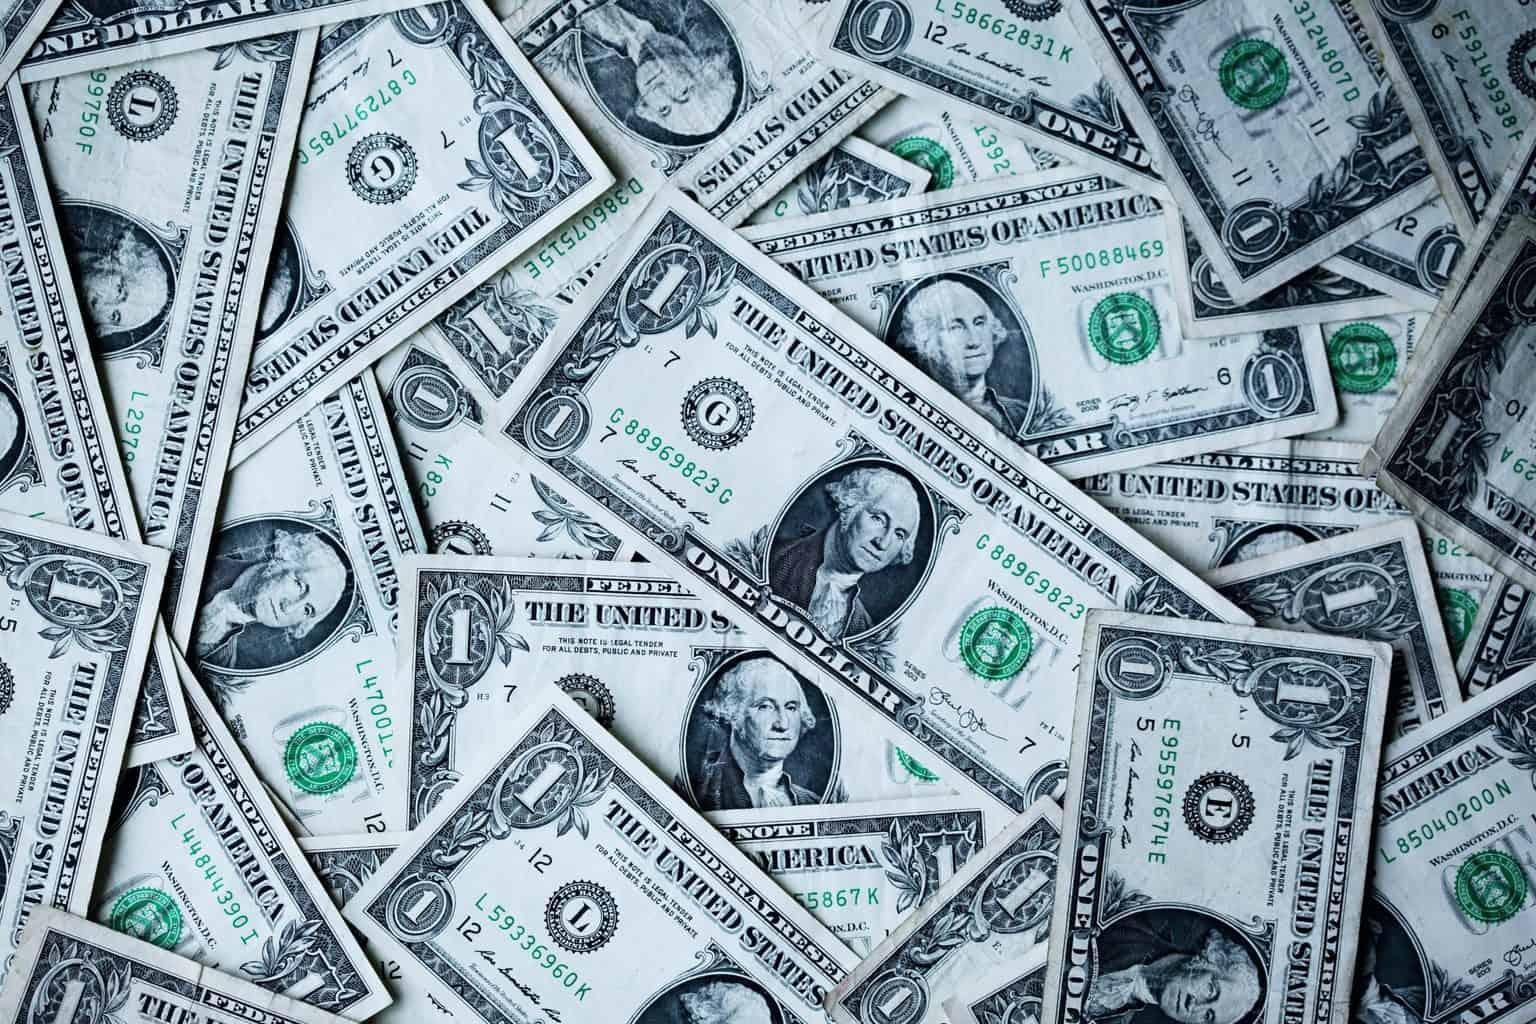 US one-dollar bills